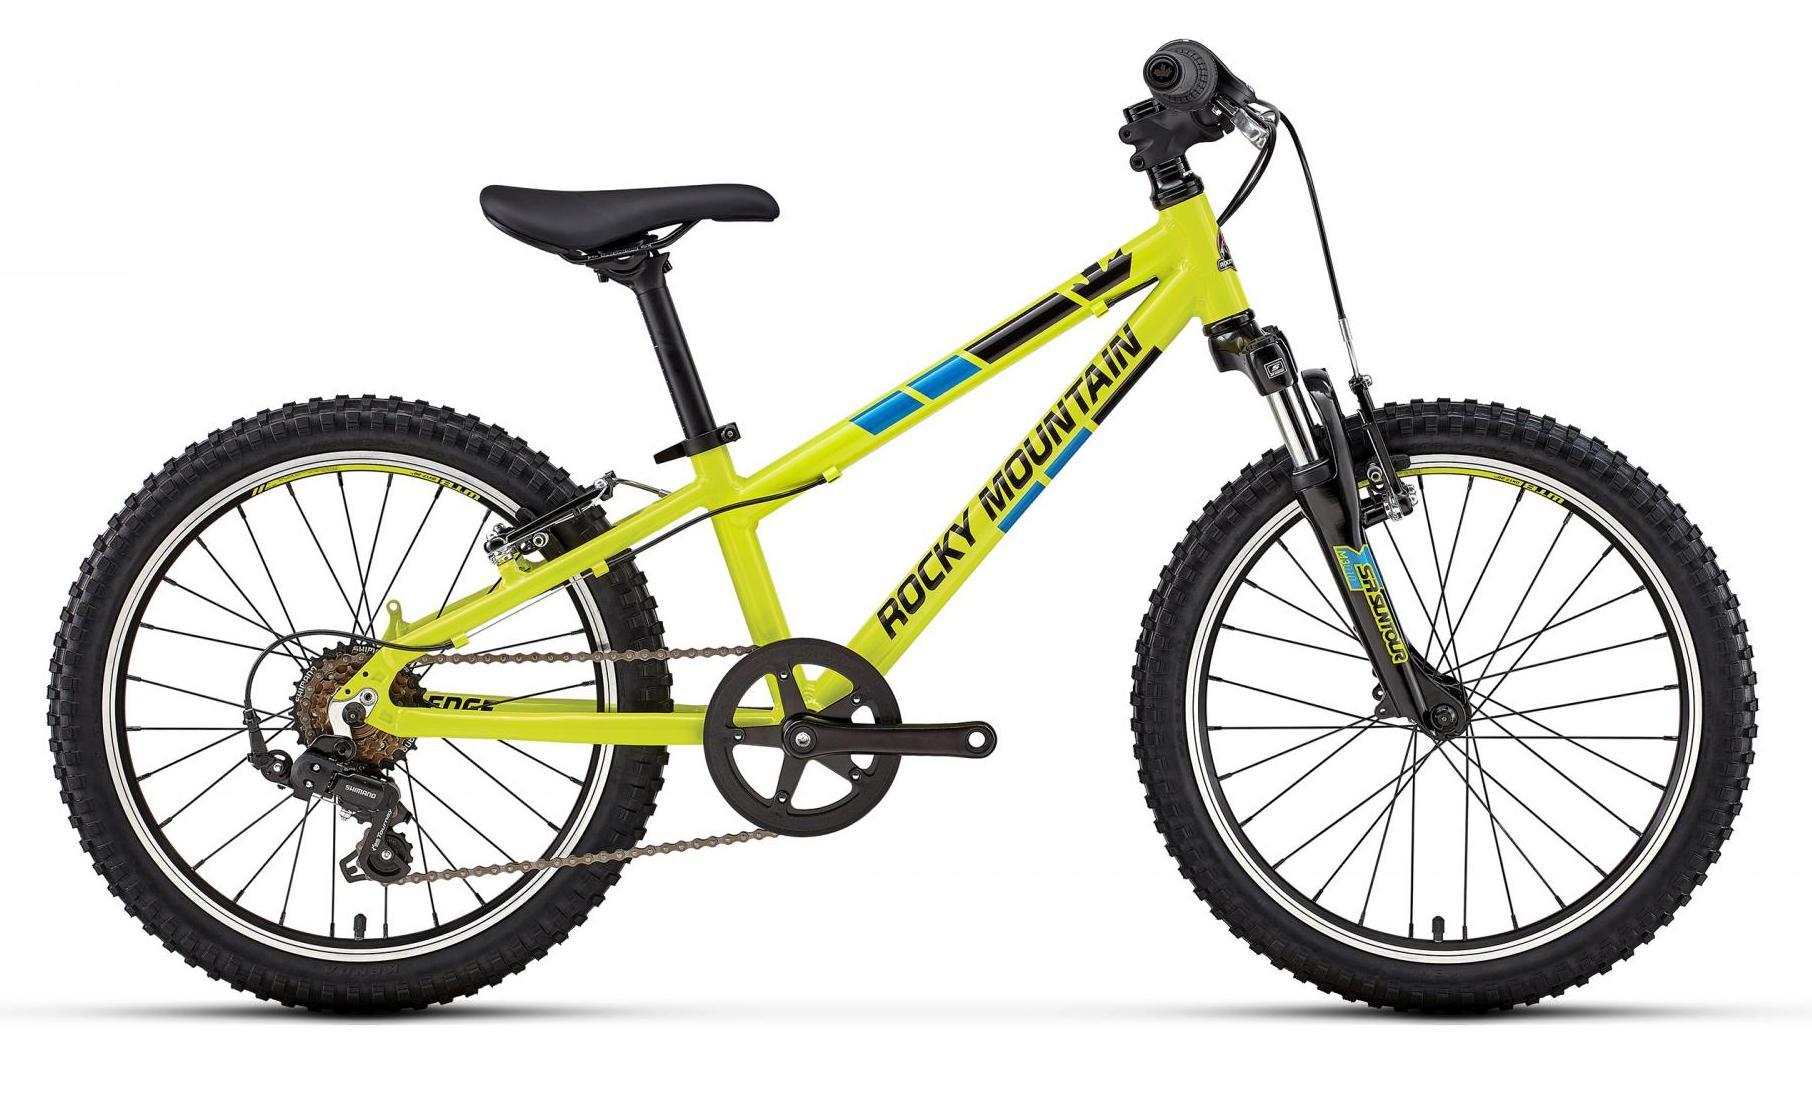 Велосипед ROCKY MOUNTAIN EDGE 20 C1 2018, Велосипеды - арт. 1032020390